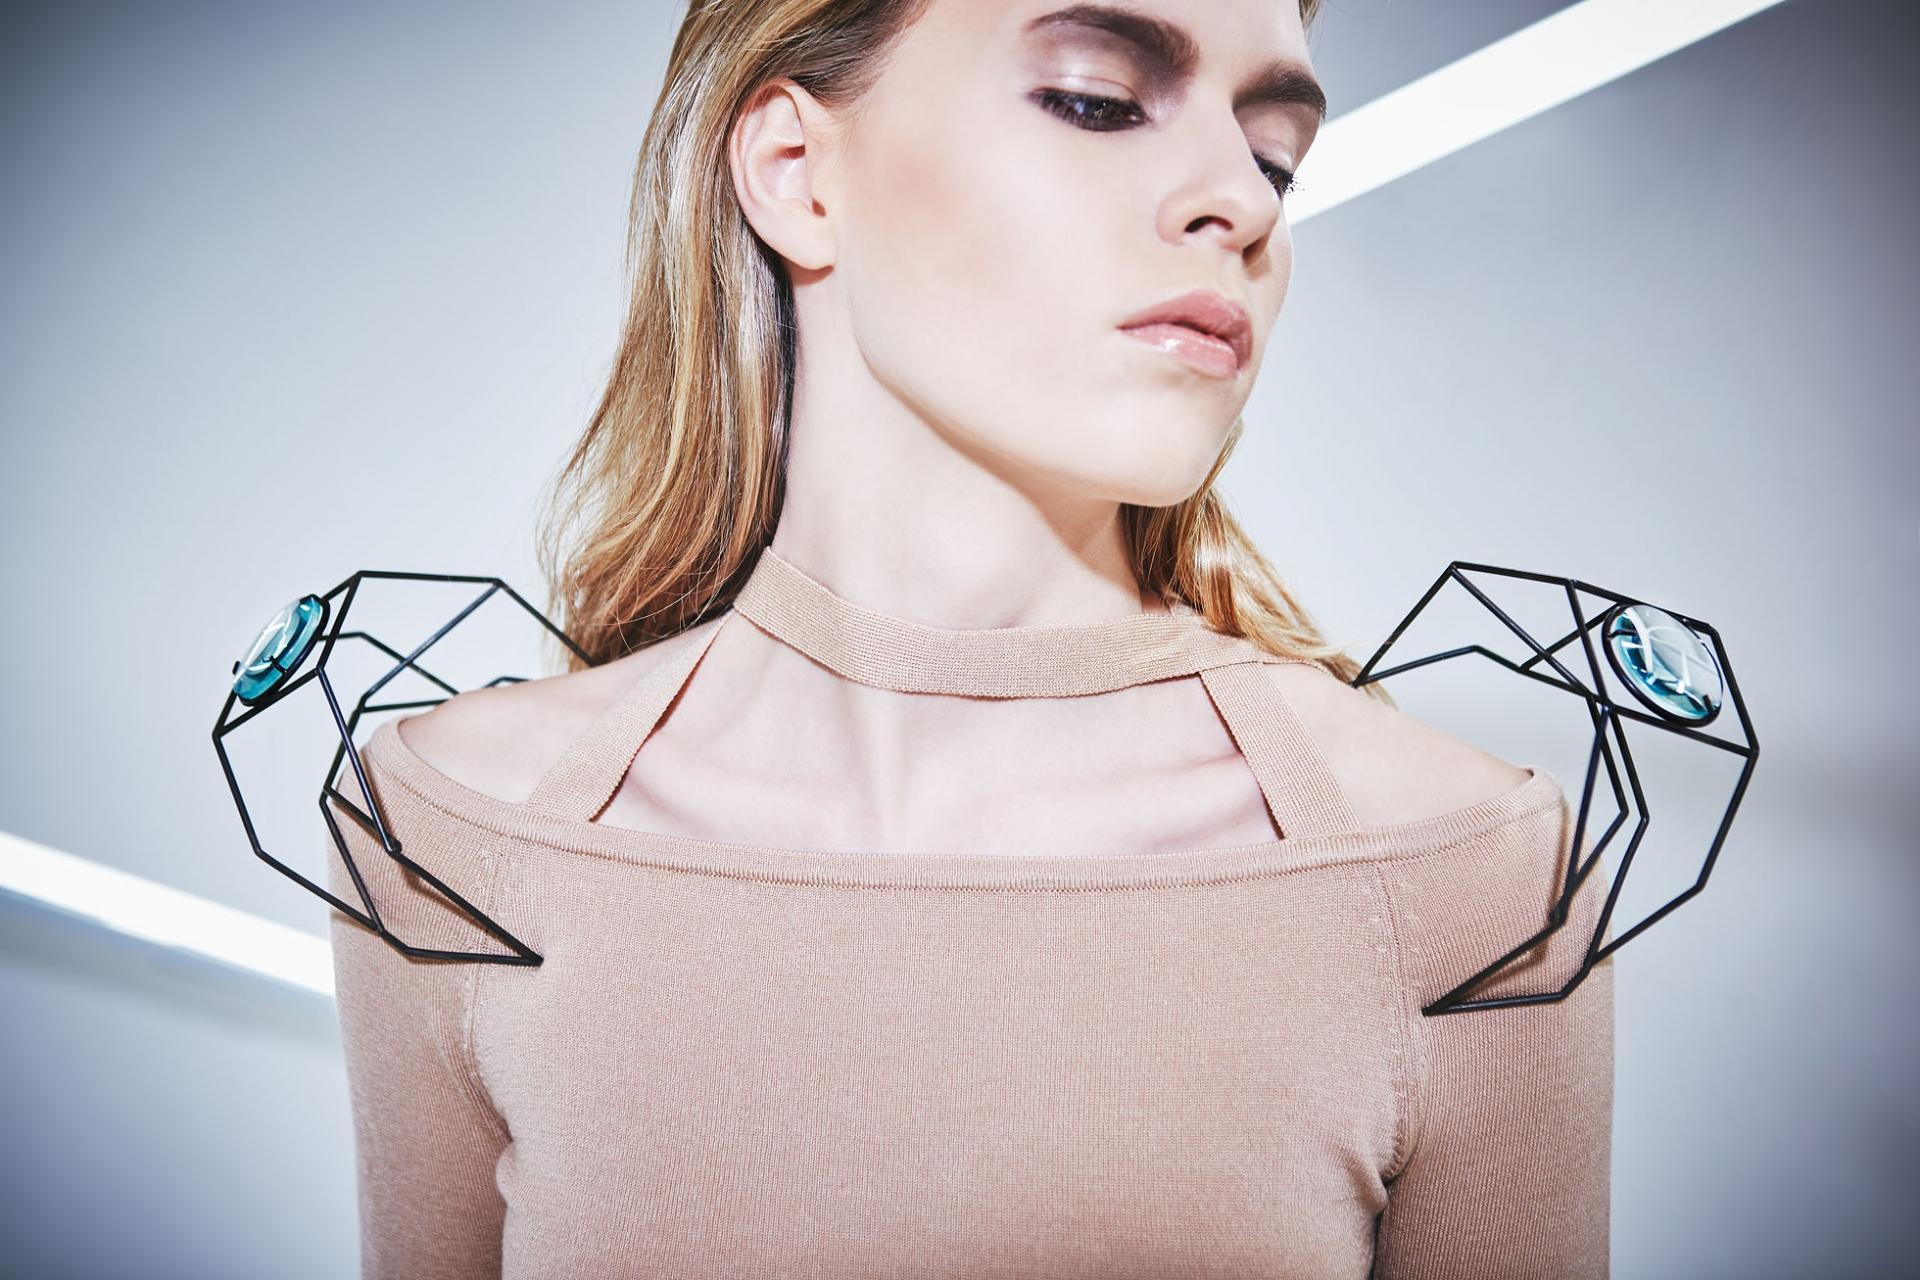 Lukas Gaechter Fashion #3